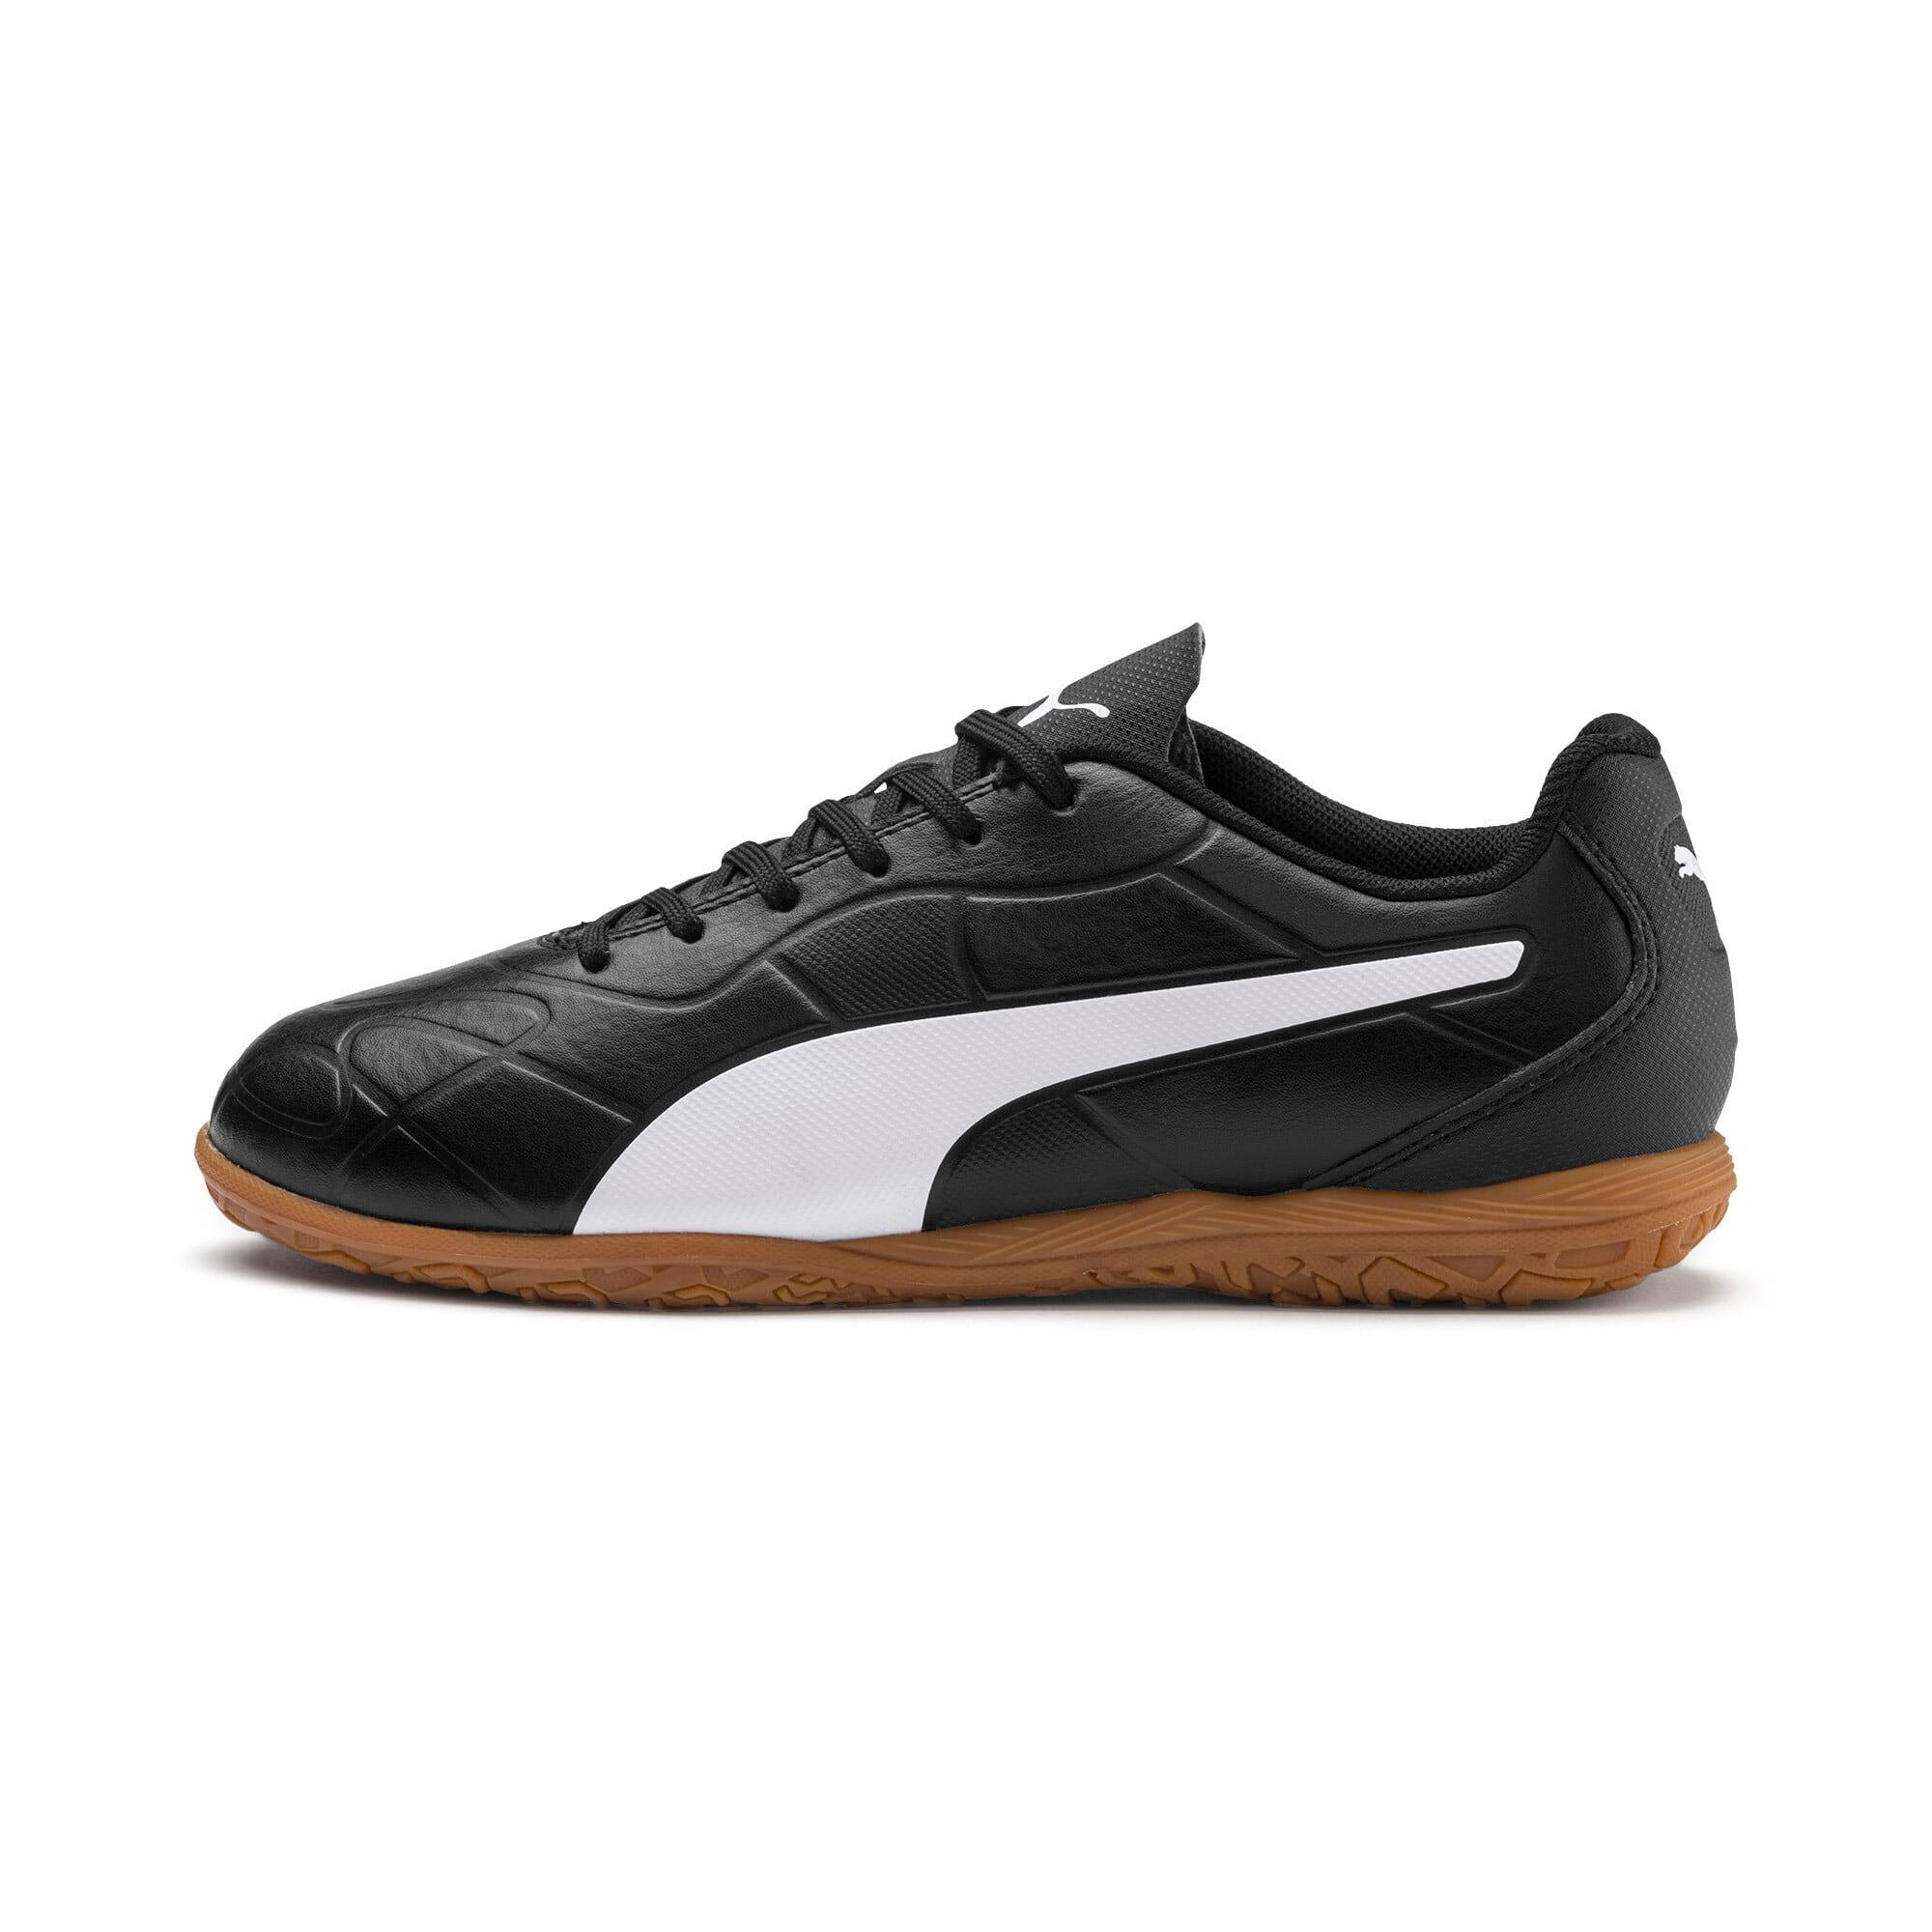 Thumbnail 1 of Monarch IT Youth Football Boot, Puma Black-Puma White, medium